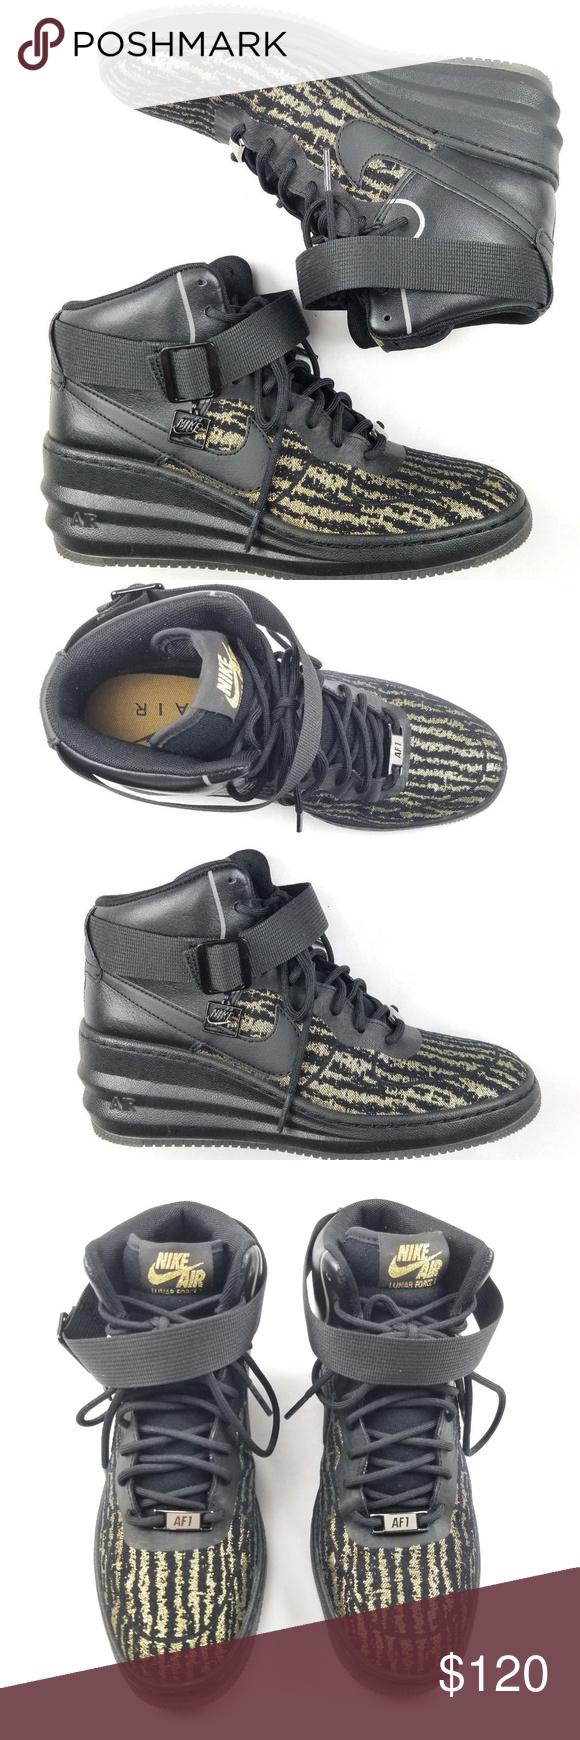 Nike Lunar Force 1 Sky Hi Jacquard Womens Wedge Nike Lunar Force 1 Sky Hi  Jacquard Wedge Shoes Black Metallic Gold Wedge Height - Approx 2.25